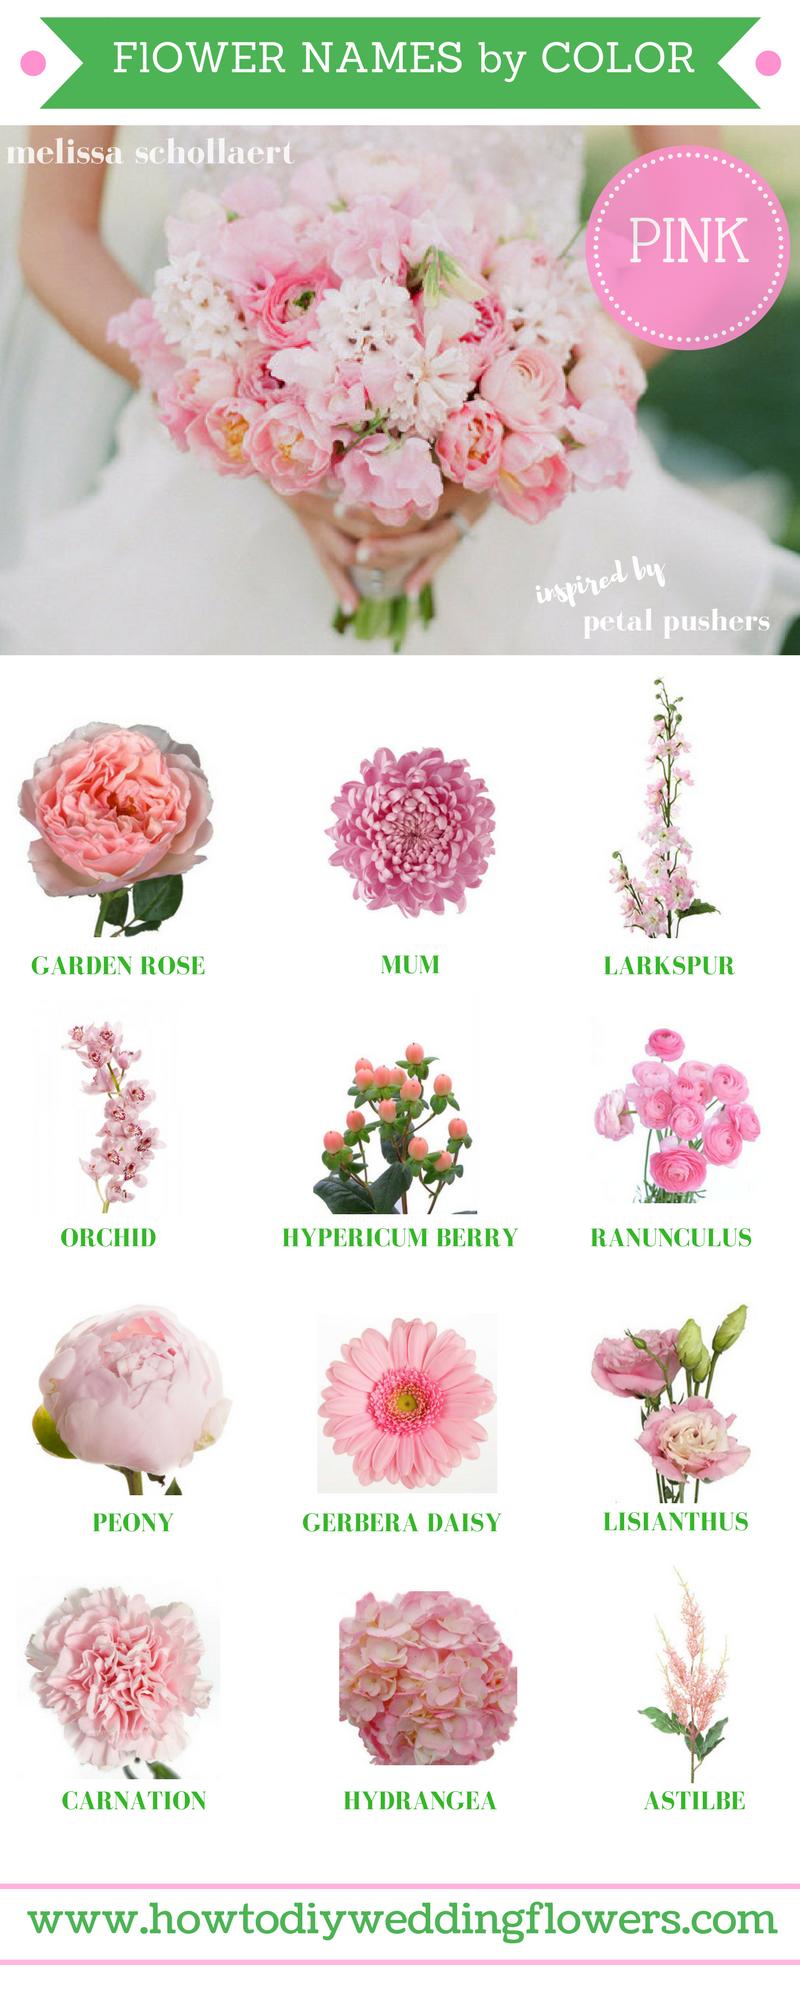 Wedding Trends 2018 How To Diy Wedding Flowers 2018 Pink Wedding